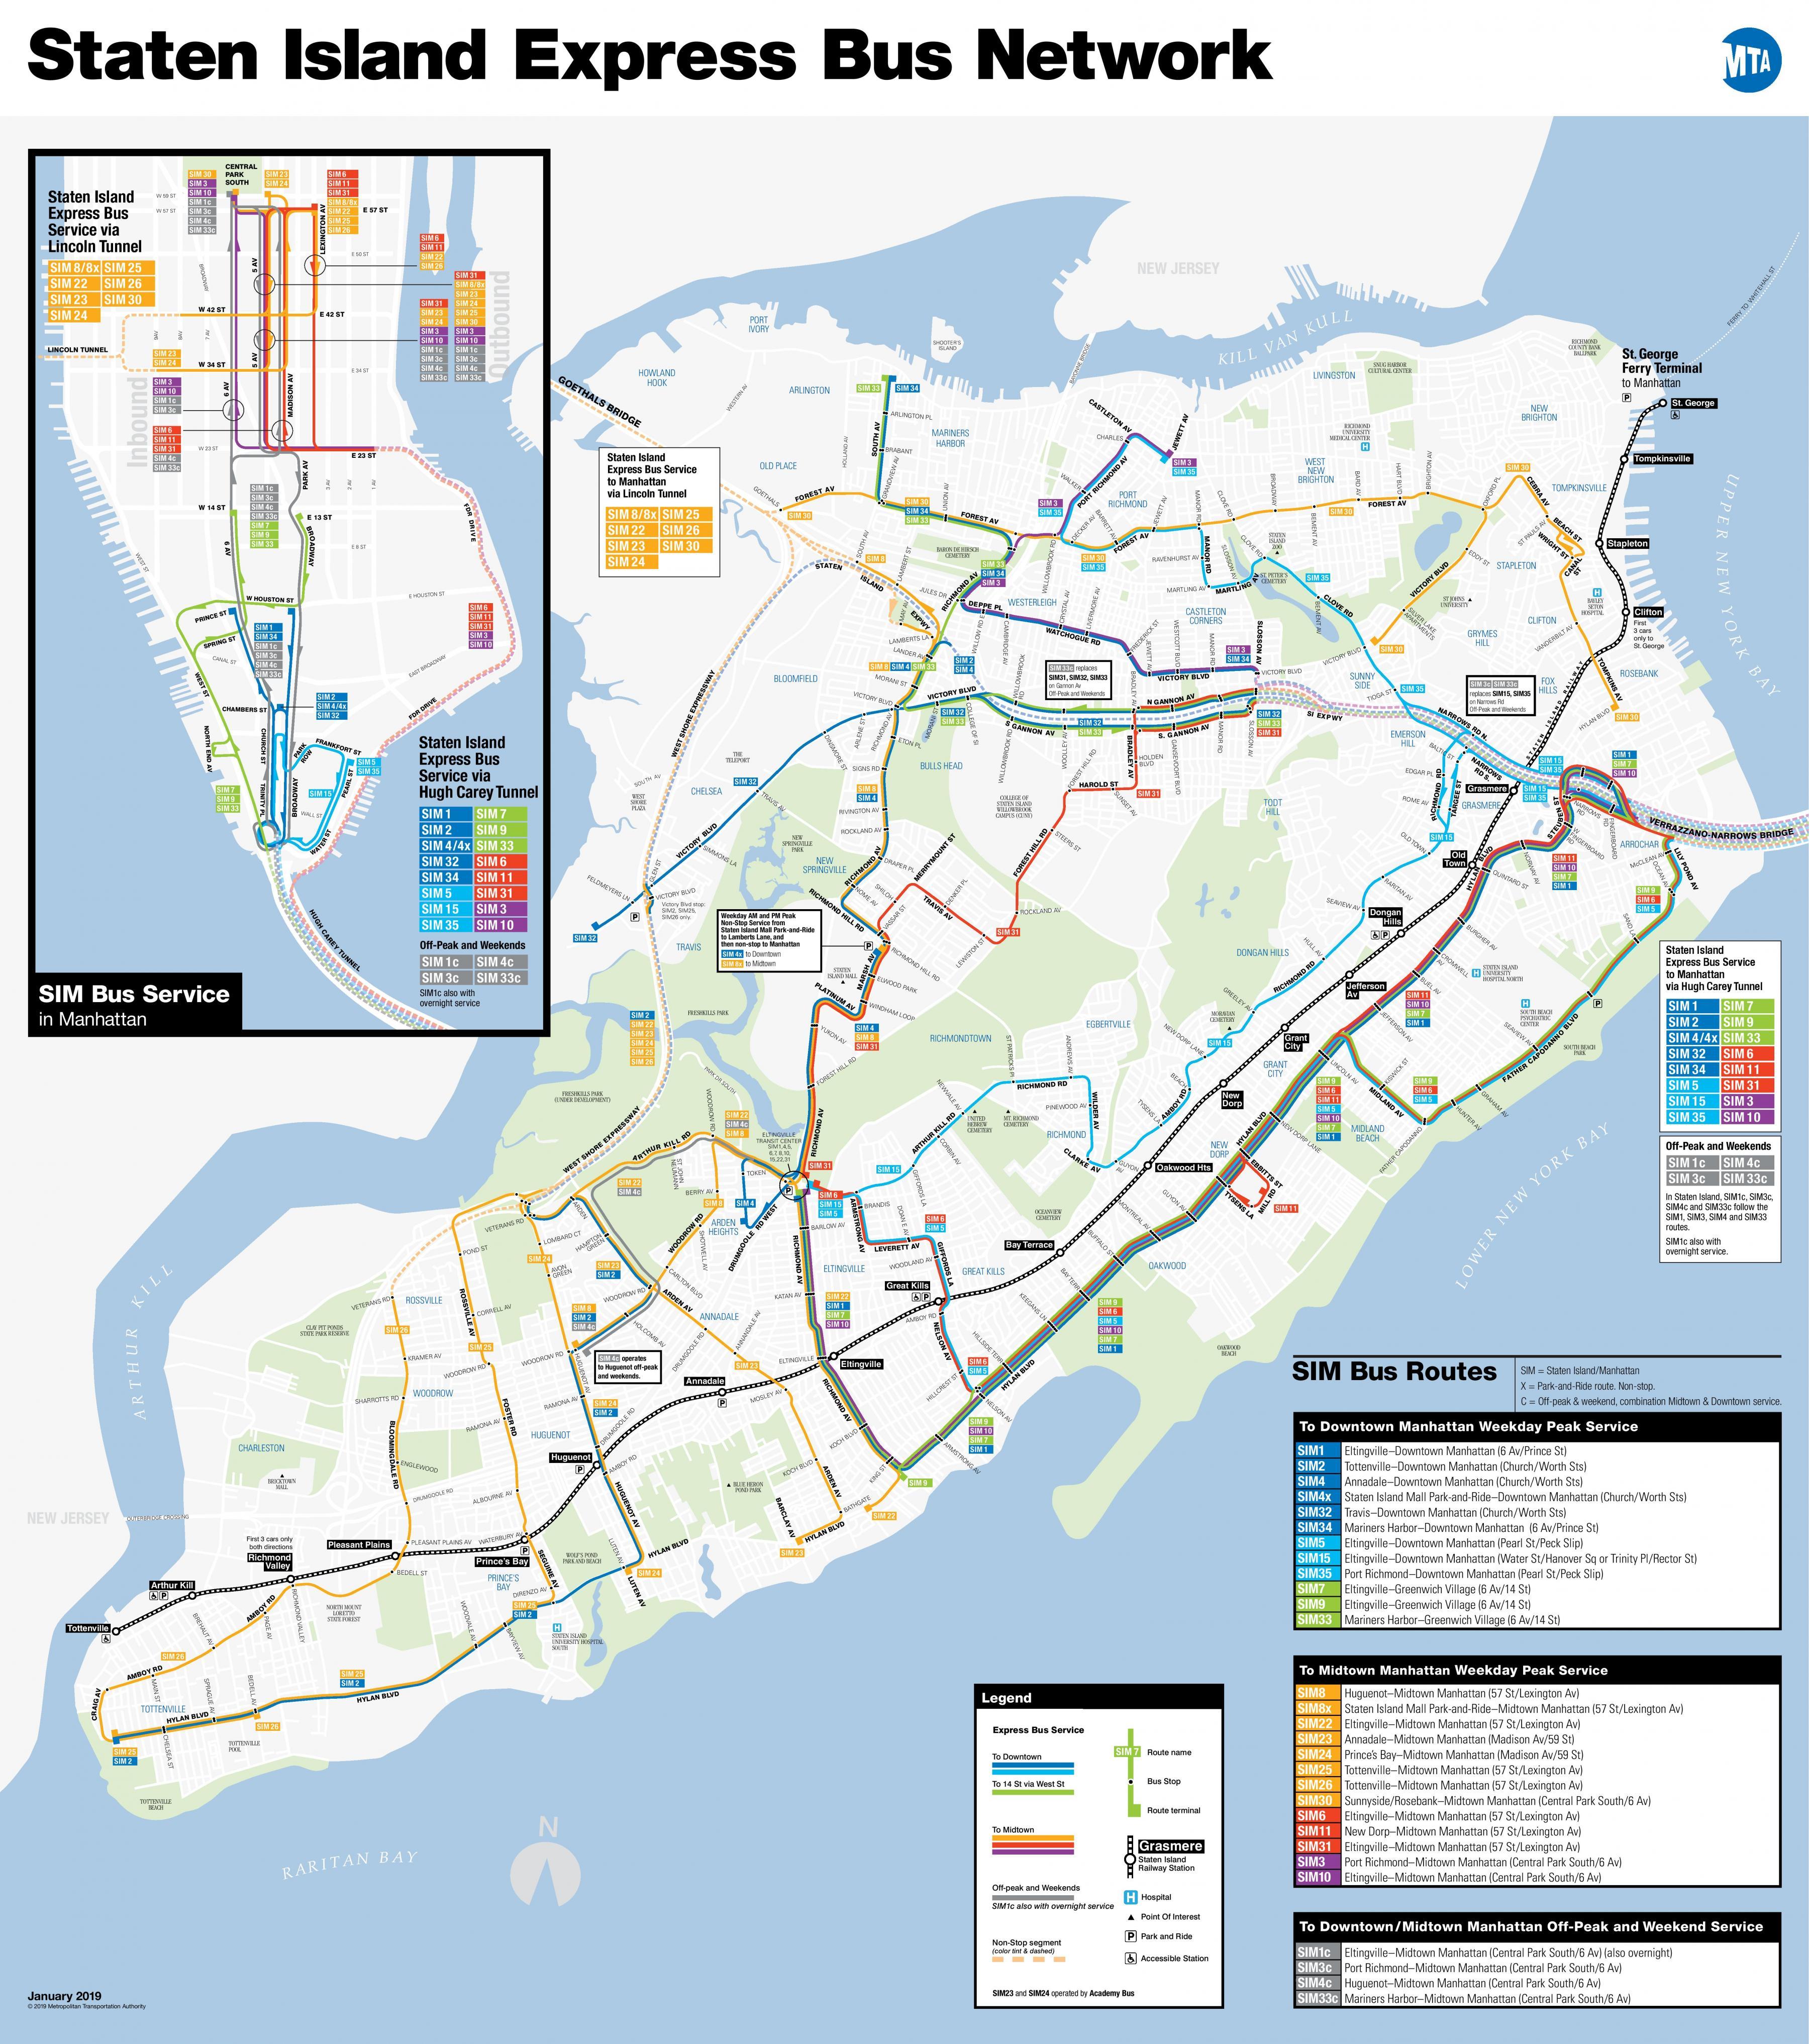 NYC express bus map MTA express bus map New York USA